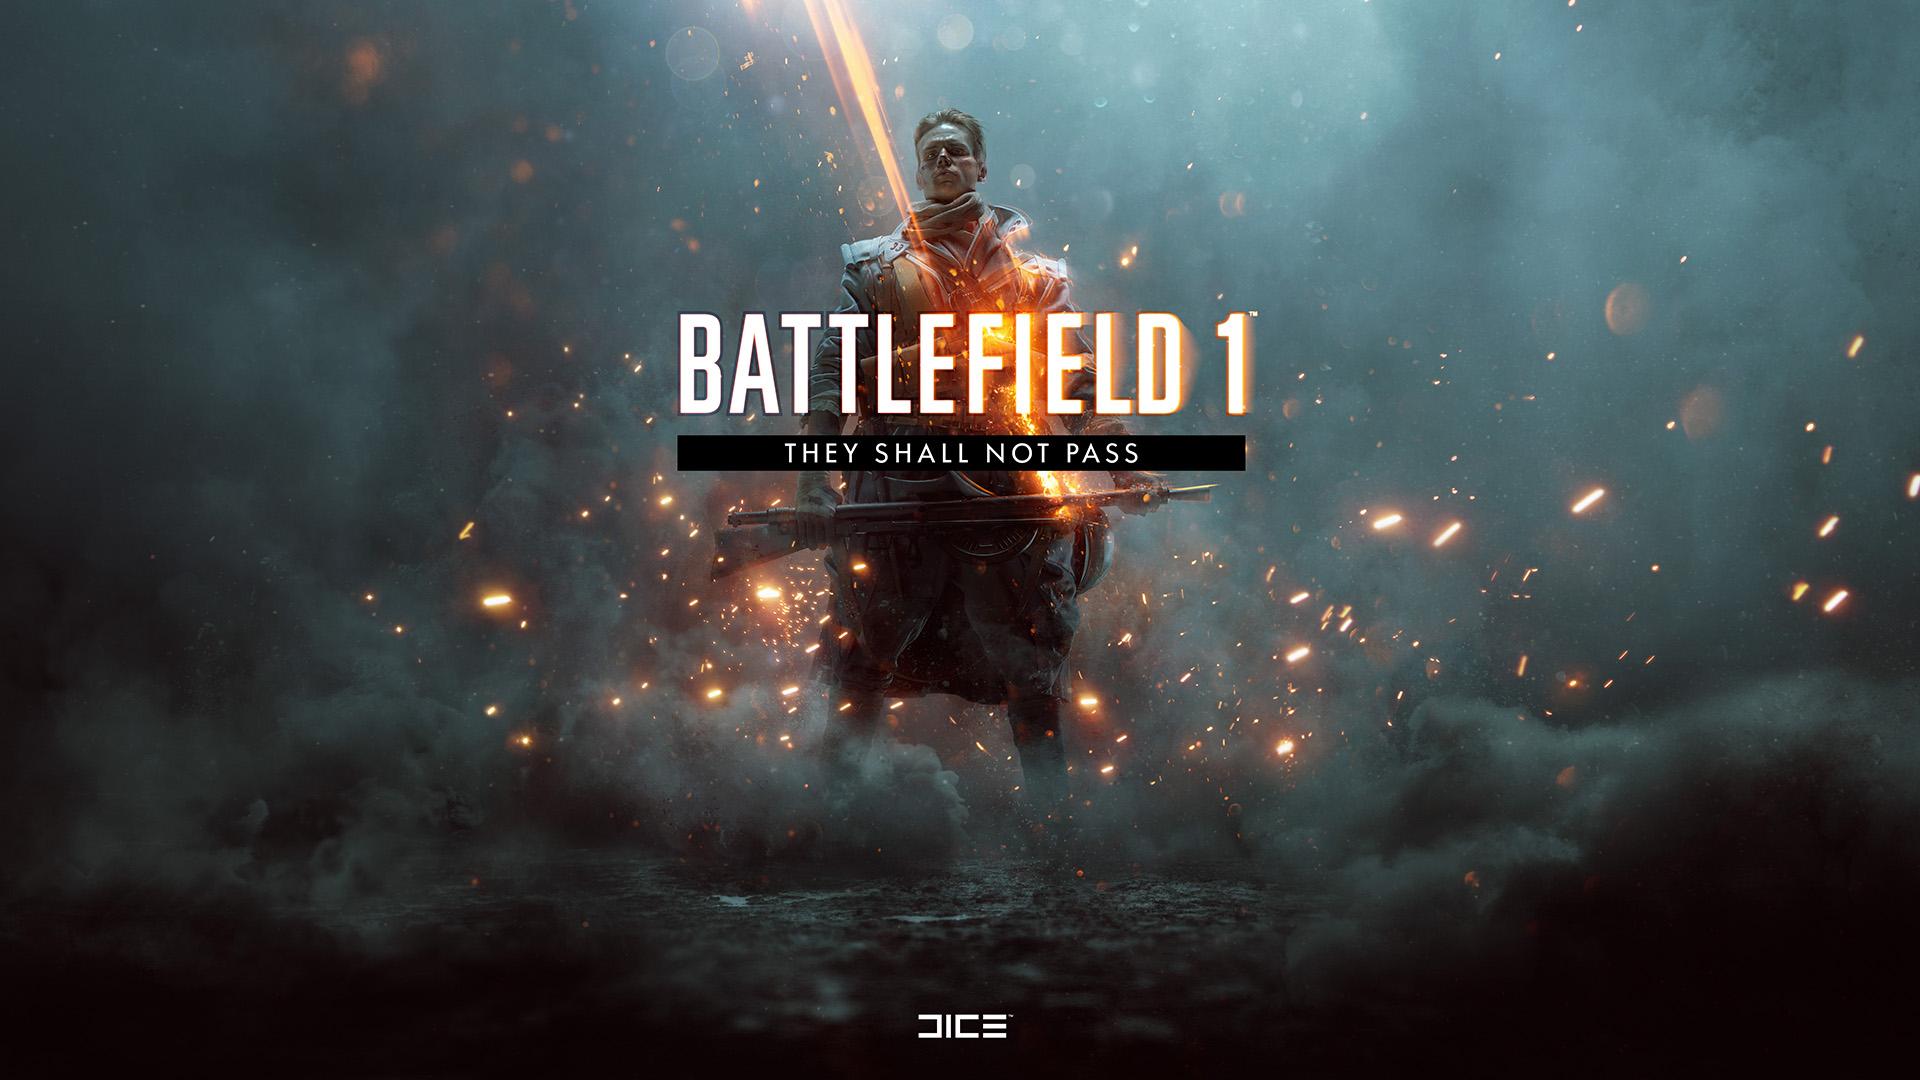 REVIEW: NUEVO DLC DE BATTLEFIELD 1